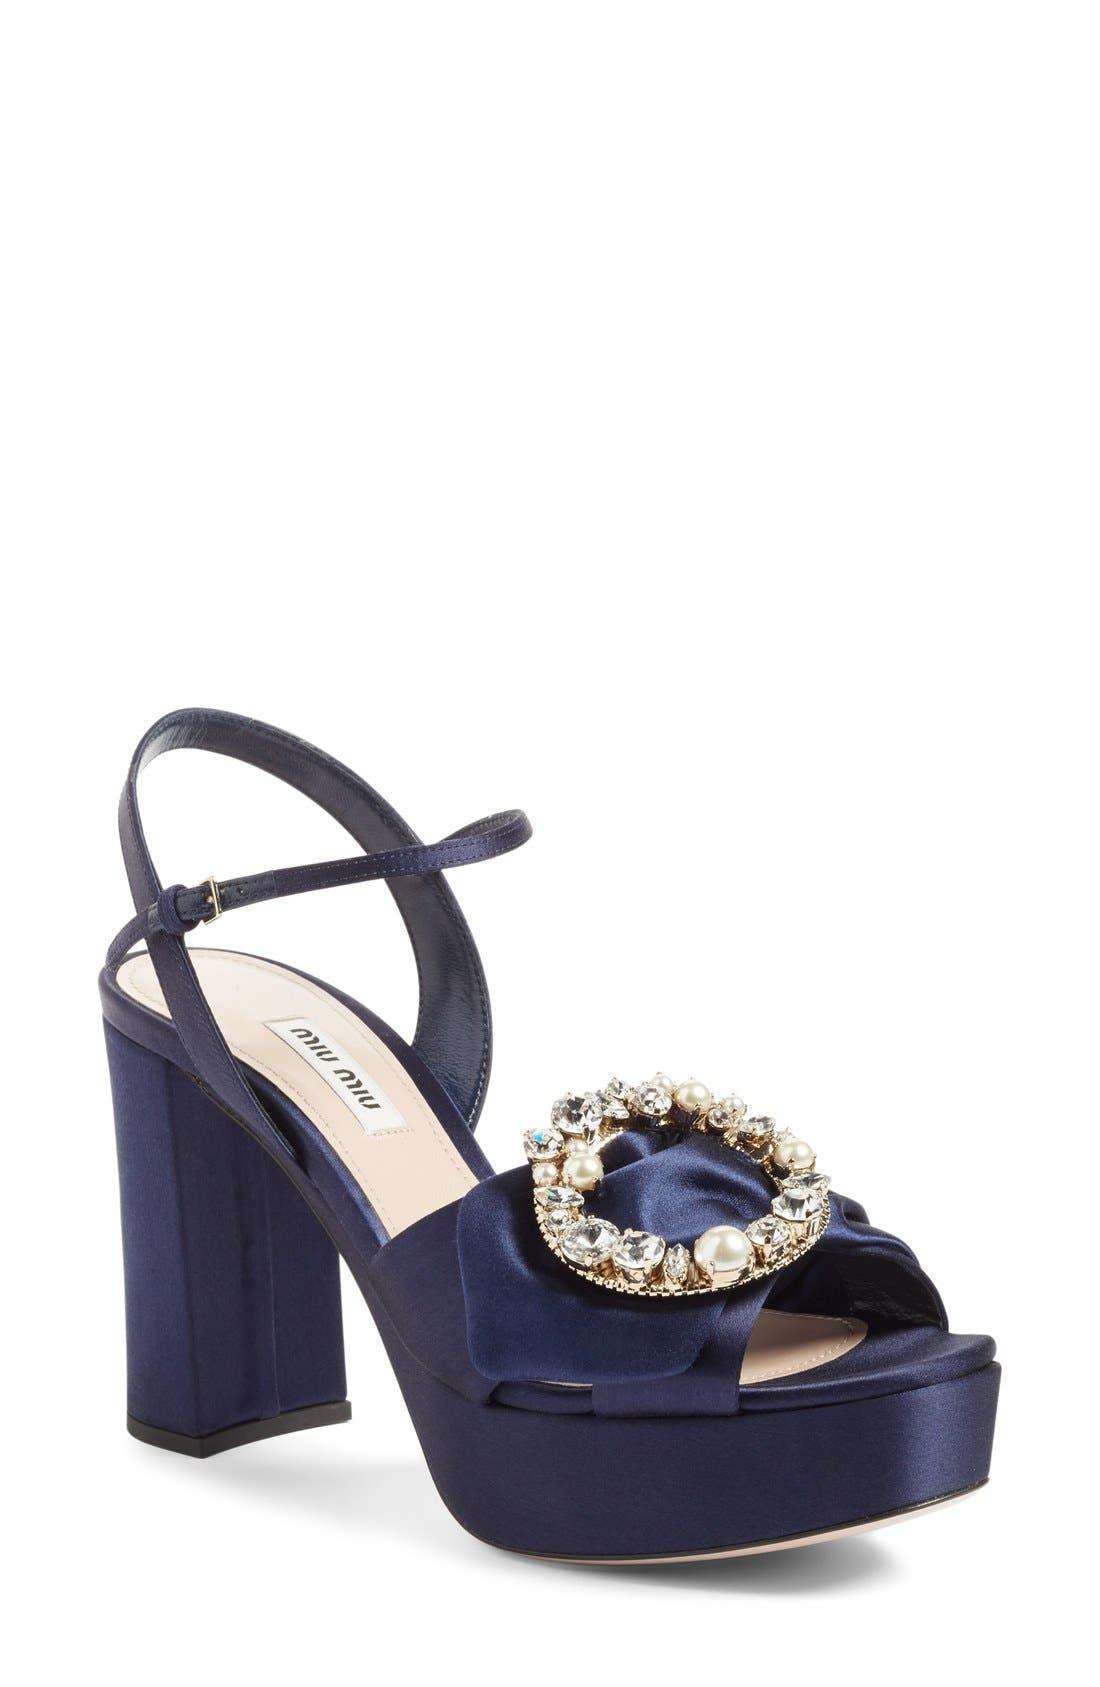 Main Image - Miu Miu Embellished Buckle Platform Sandal (Women)